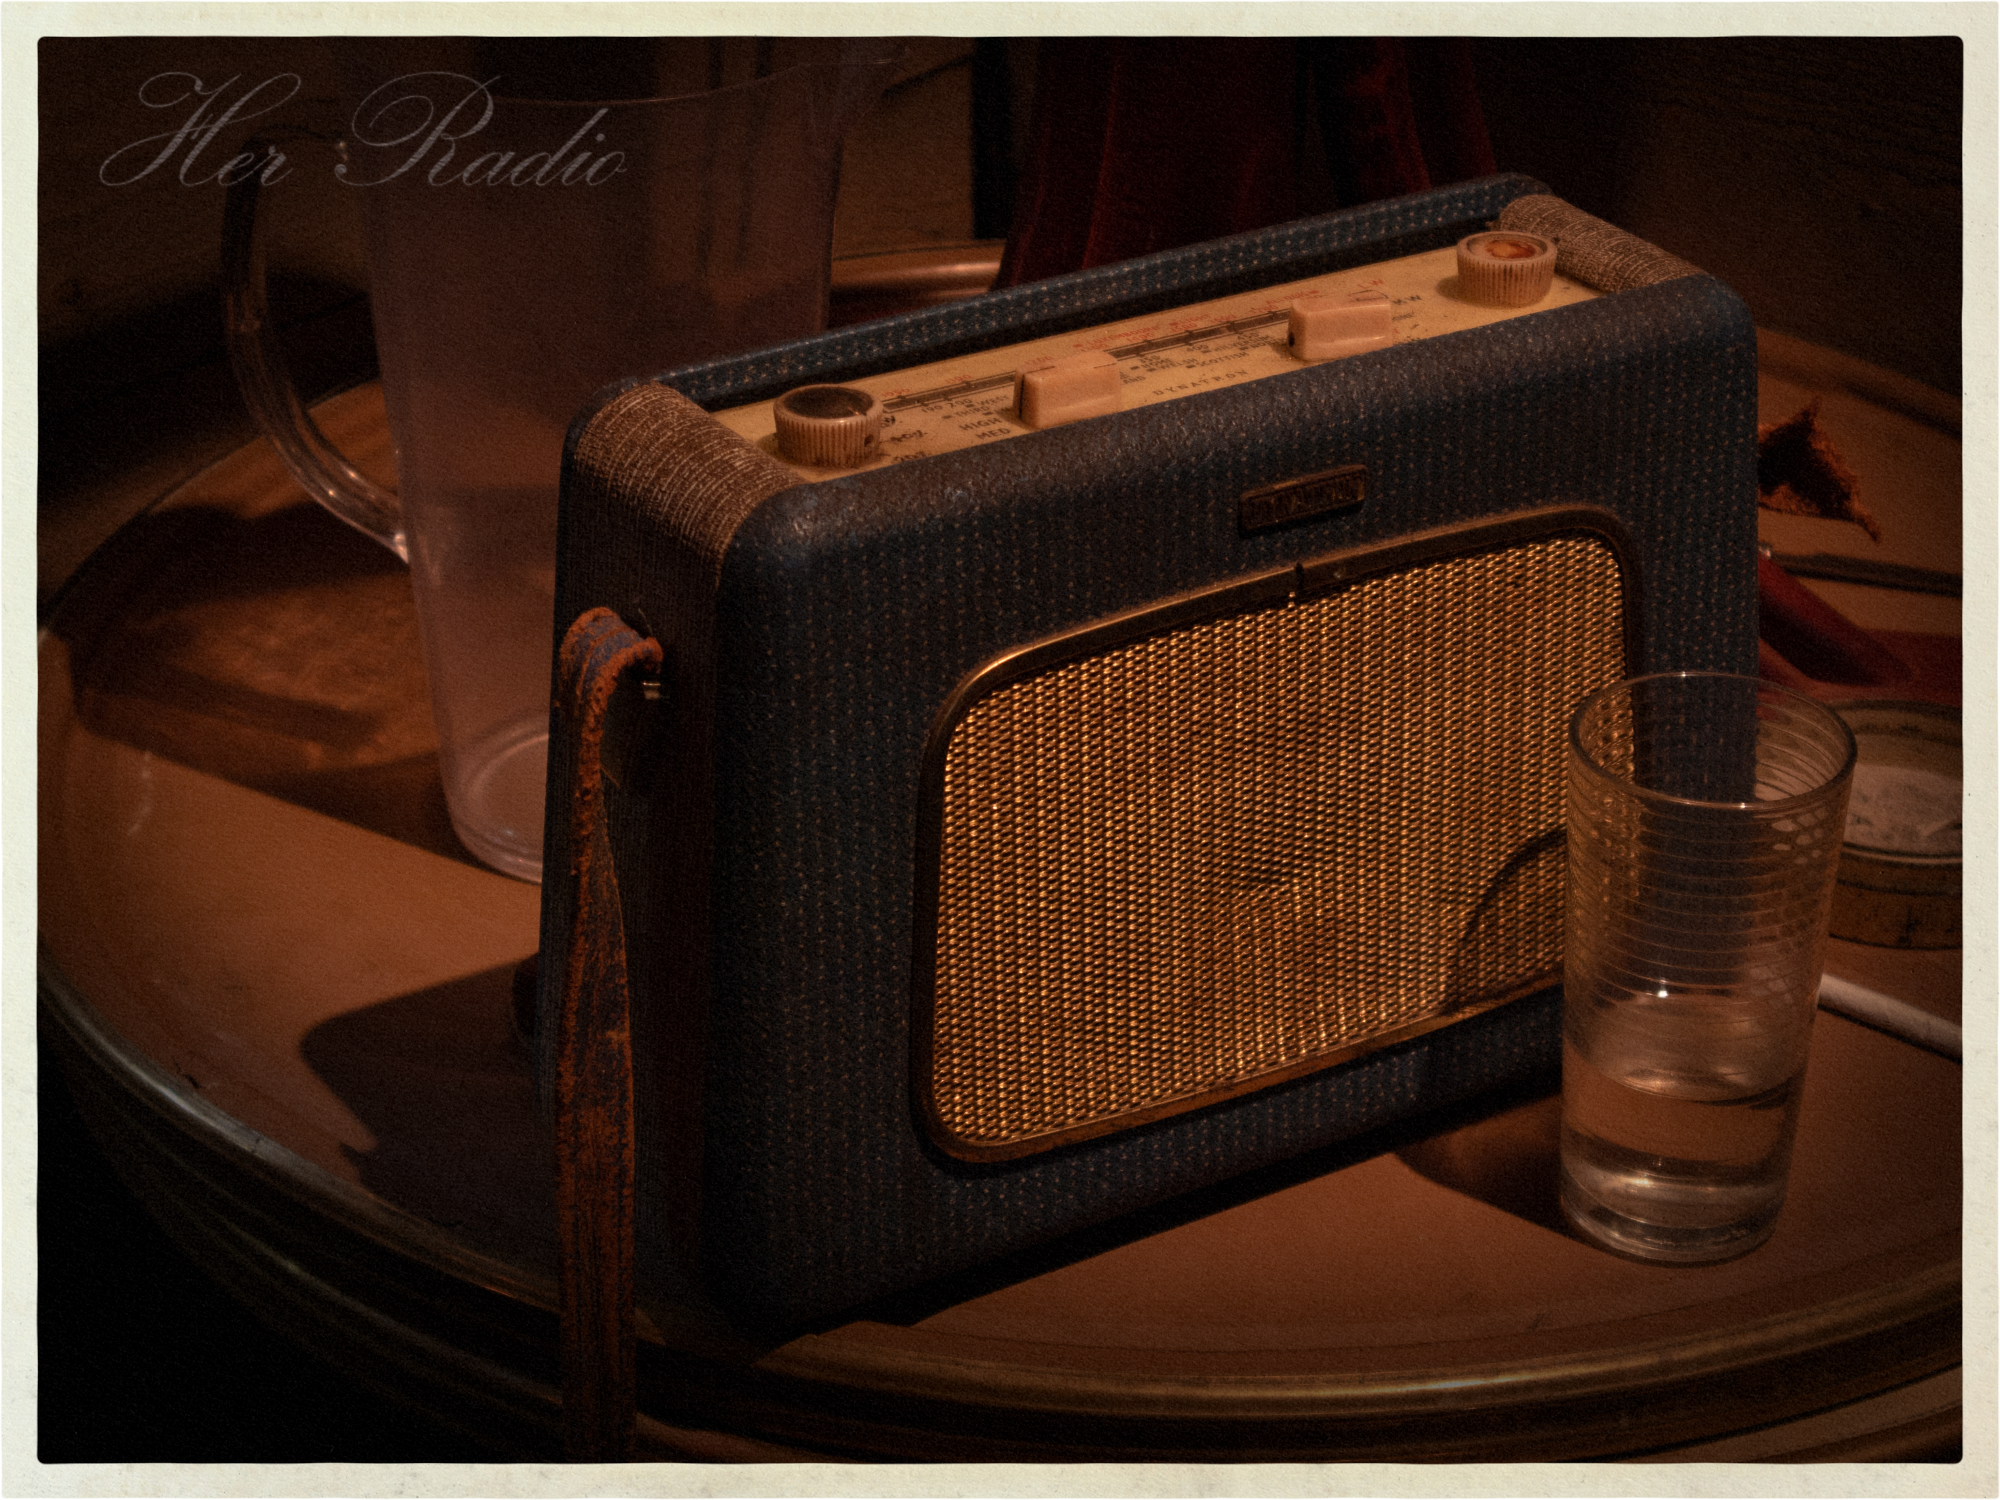 Her radio, swells.